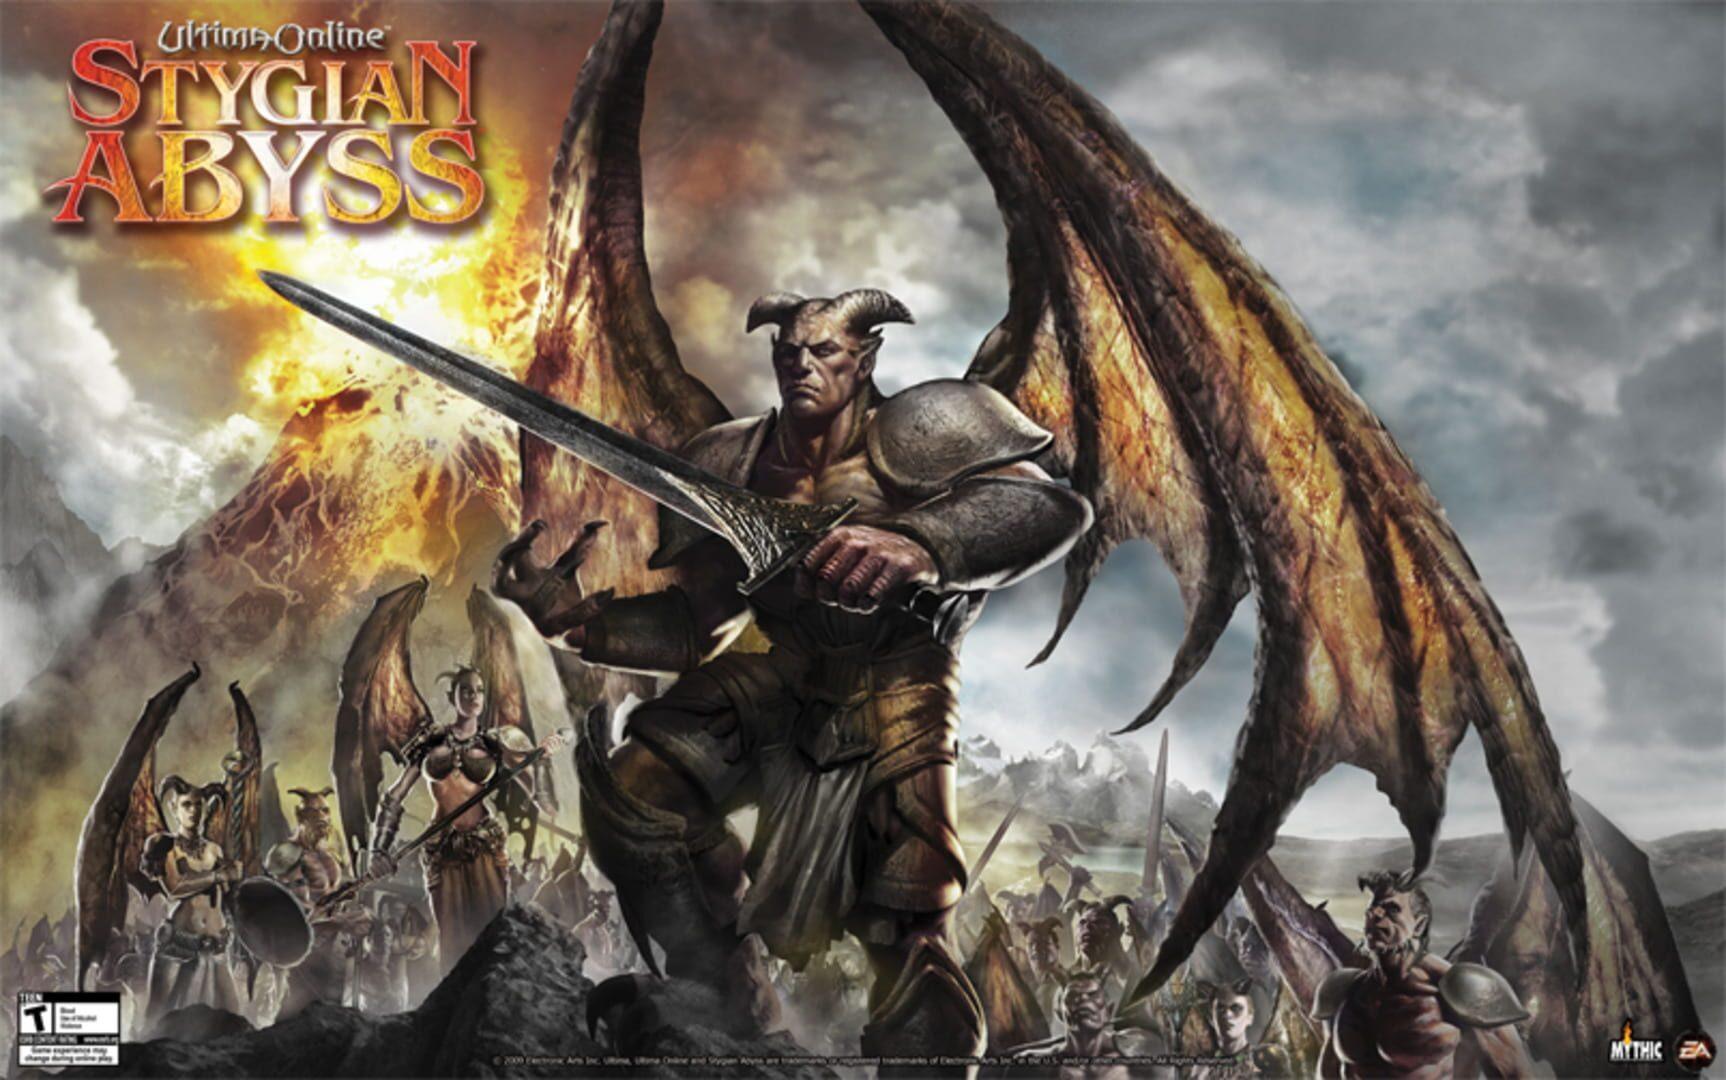 buy Ultima Online: Stygian Abyss cd key for all platform